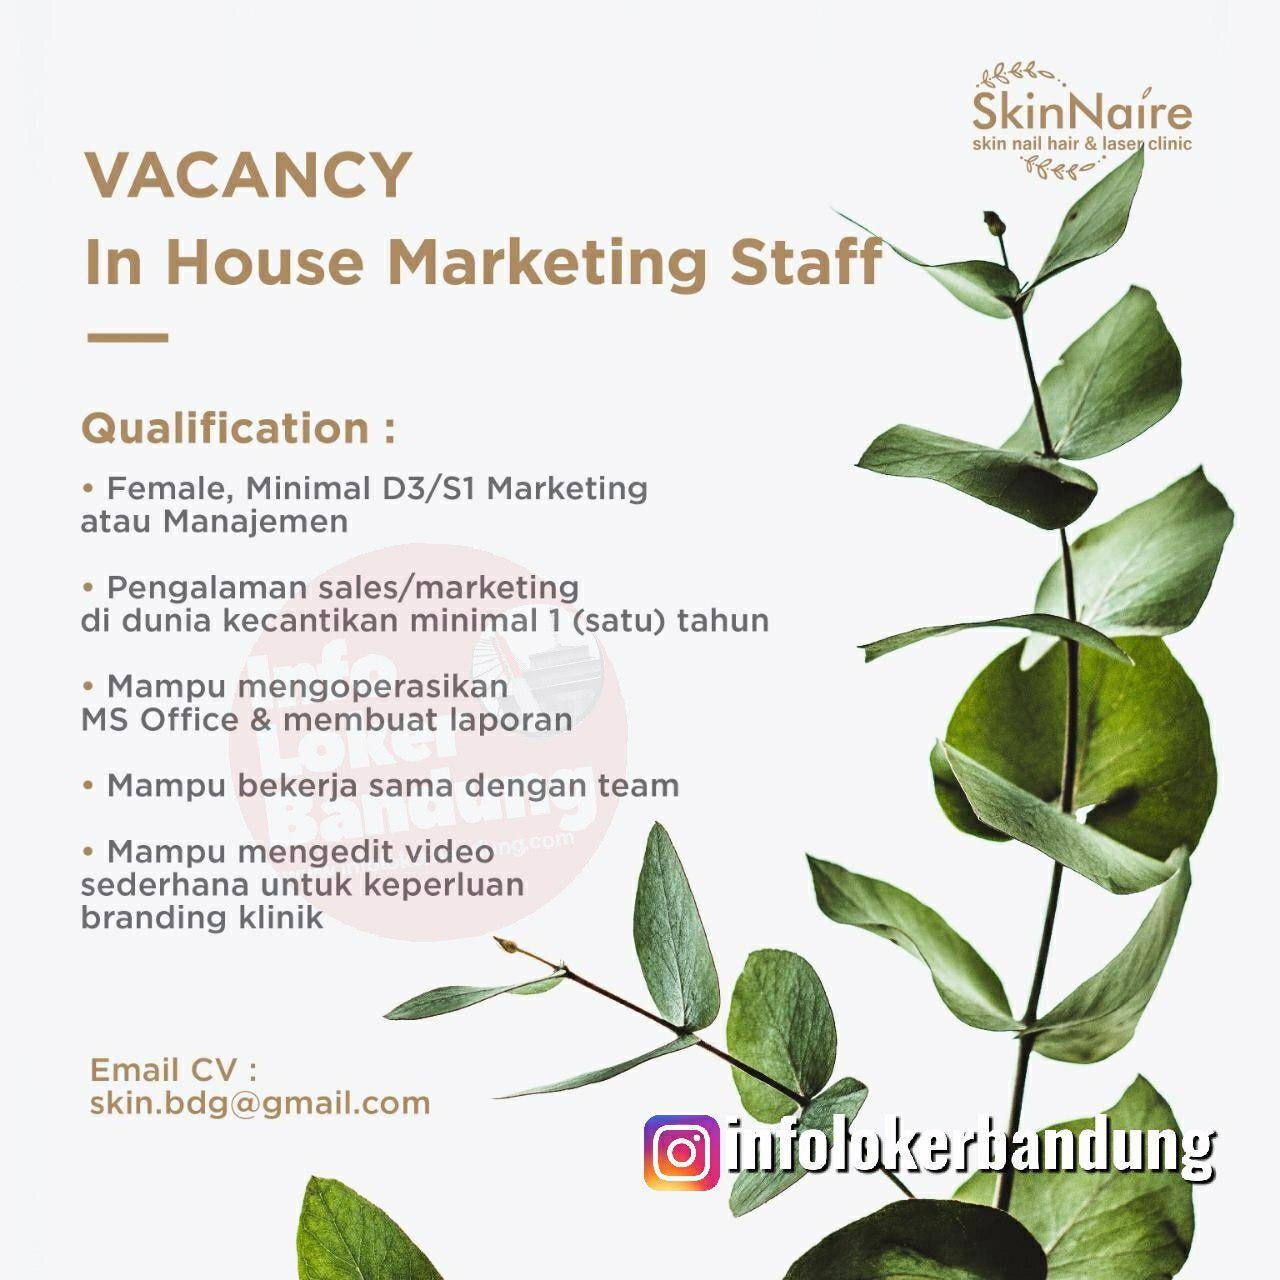 Lowongan Kerja In House Marketing Staff & Clinic General Manager Skin Naire Bandung November 2019